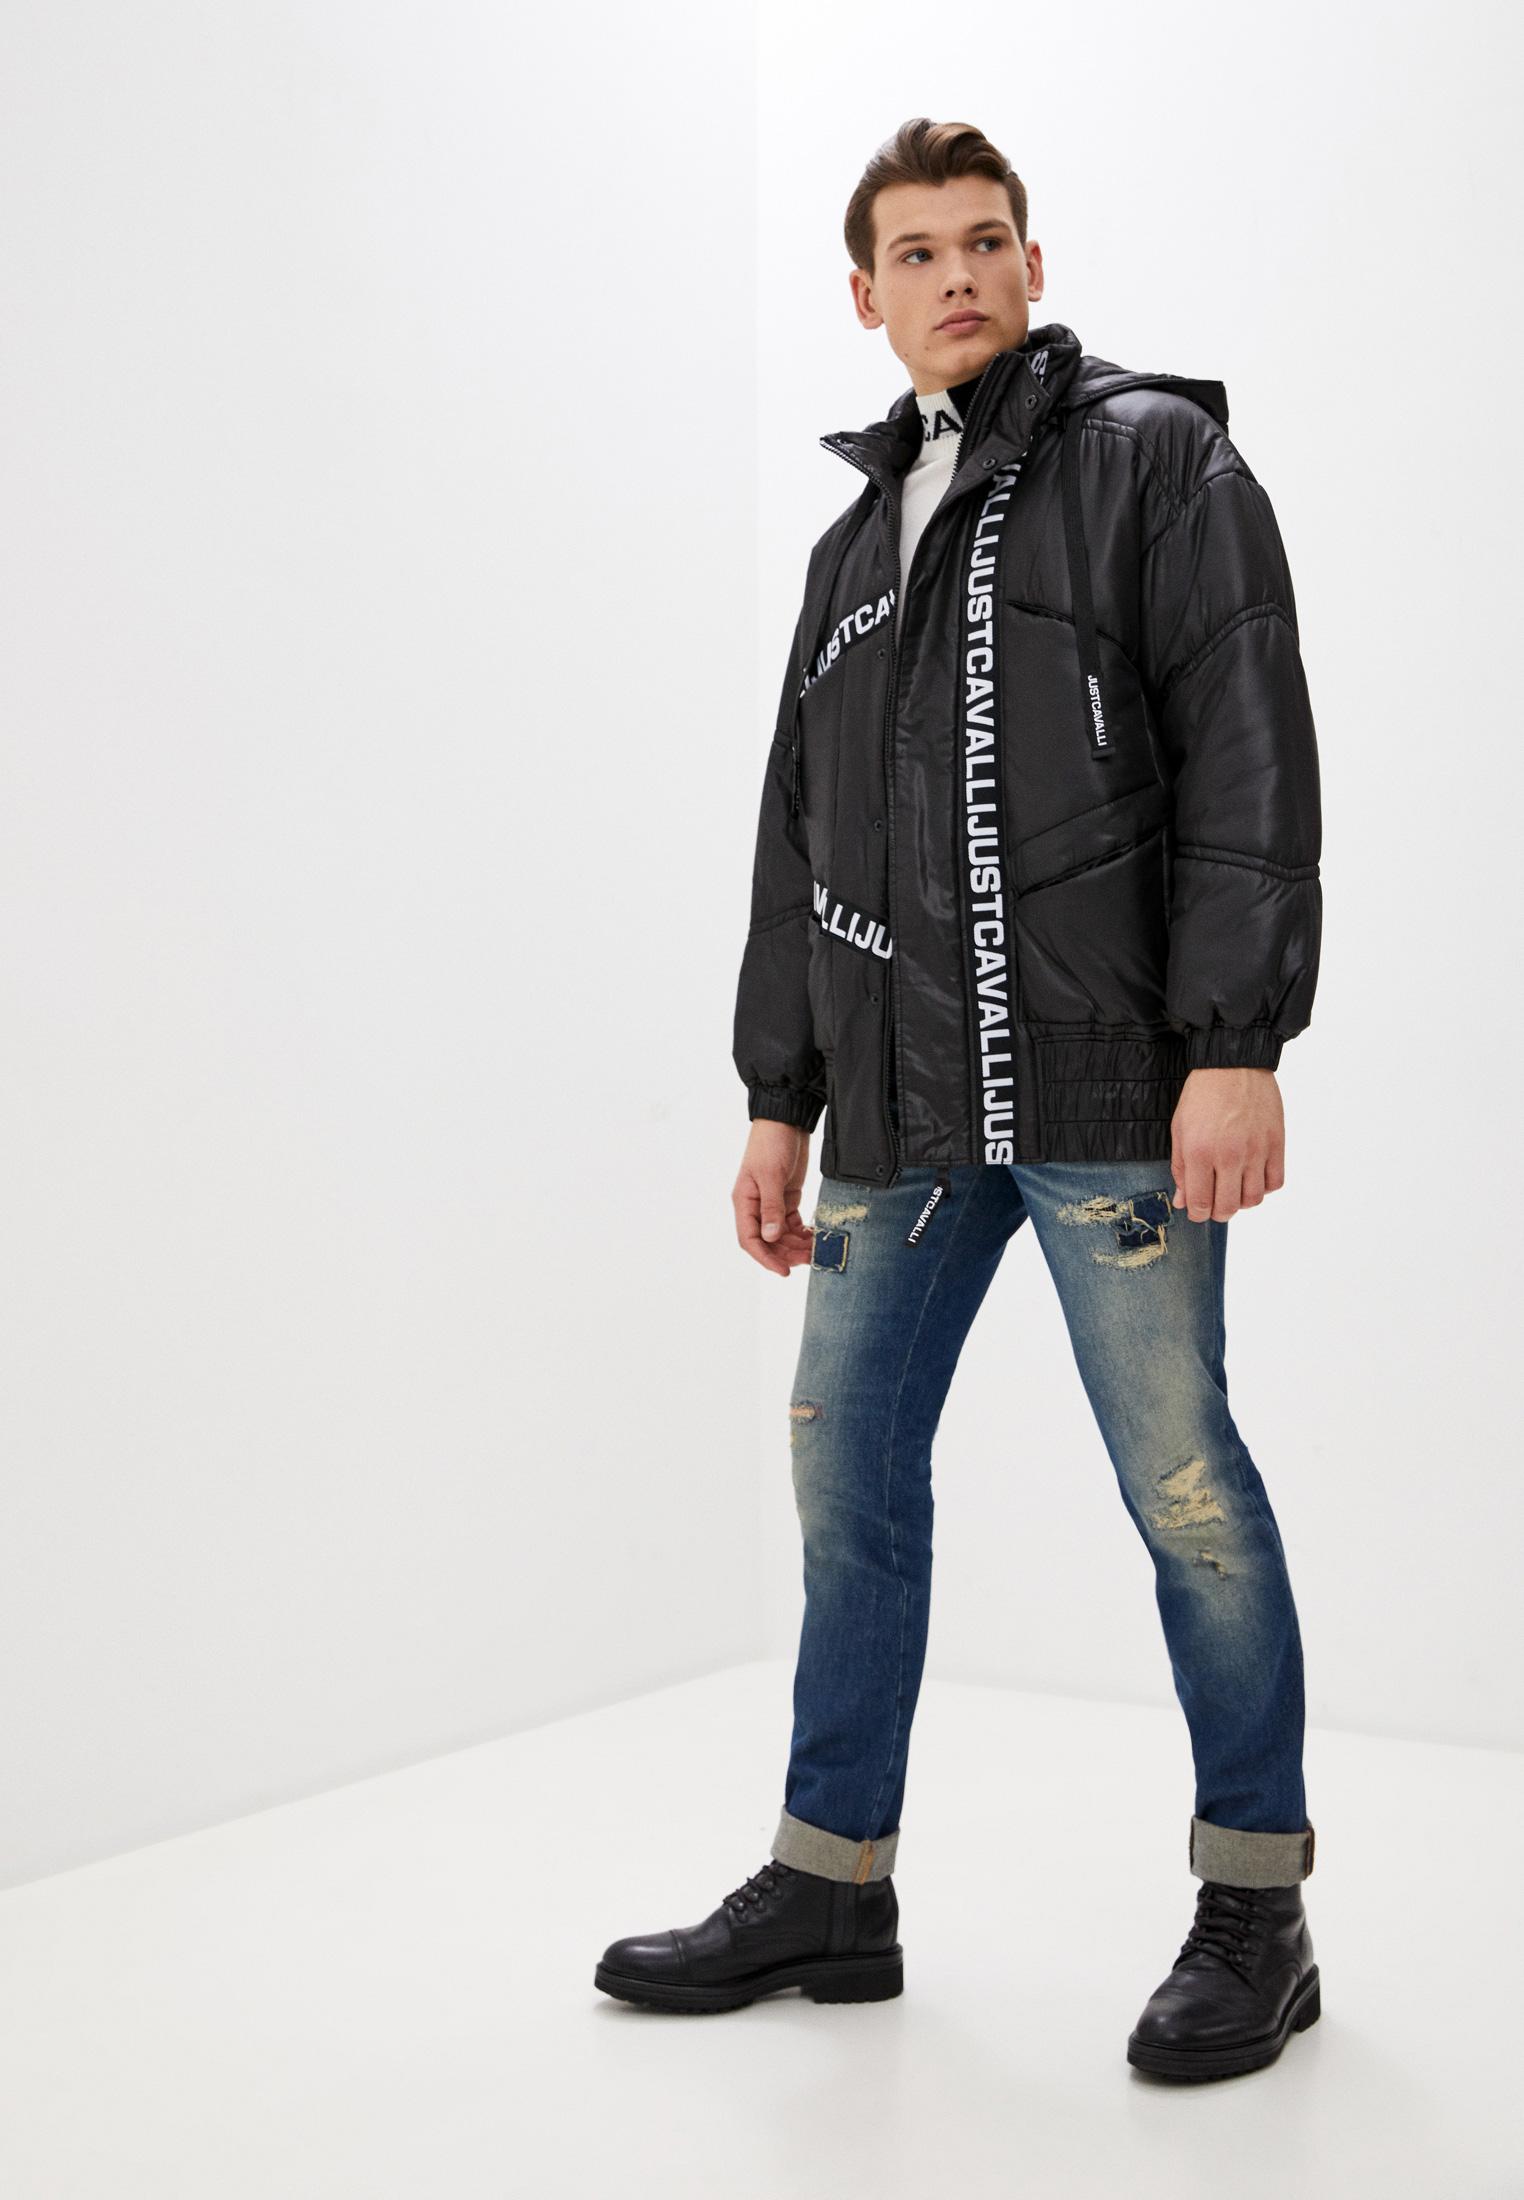 Куртка Just Cavalli (Джаст Кавалли) s01am0330n39530: изображение 3